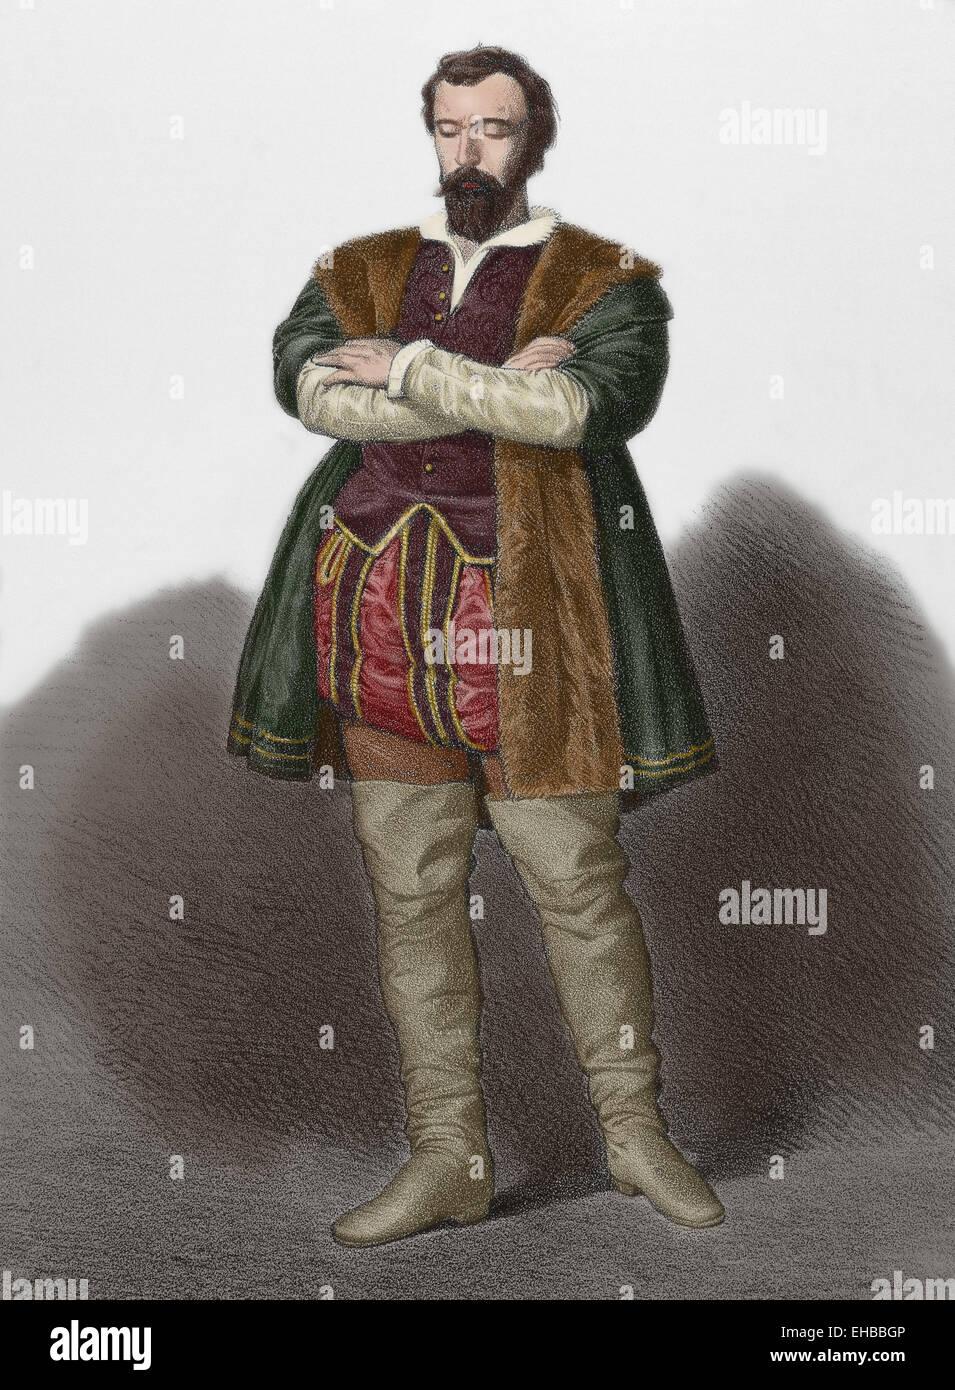 Juan Lopez de Padilla (1490-1521). Insurrectionary leader in the Castilian War of the Communities. Portrait. Engraving - Stock Image